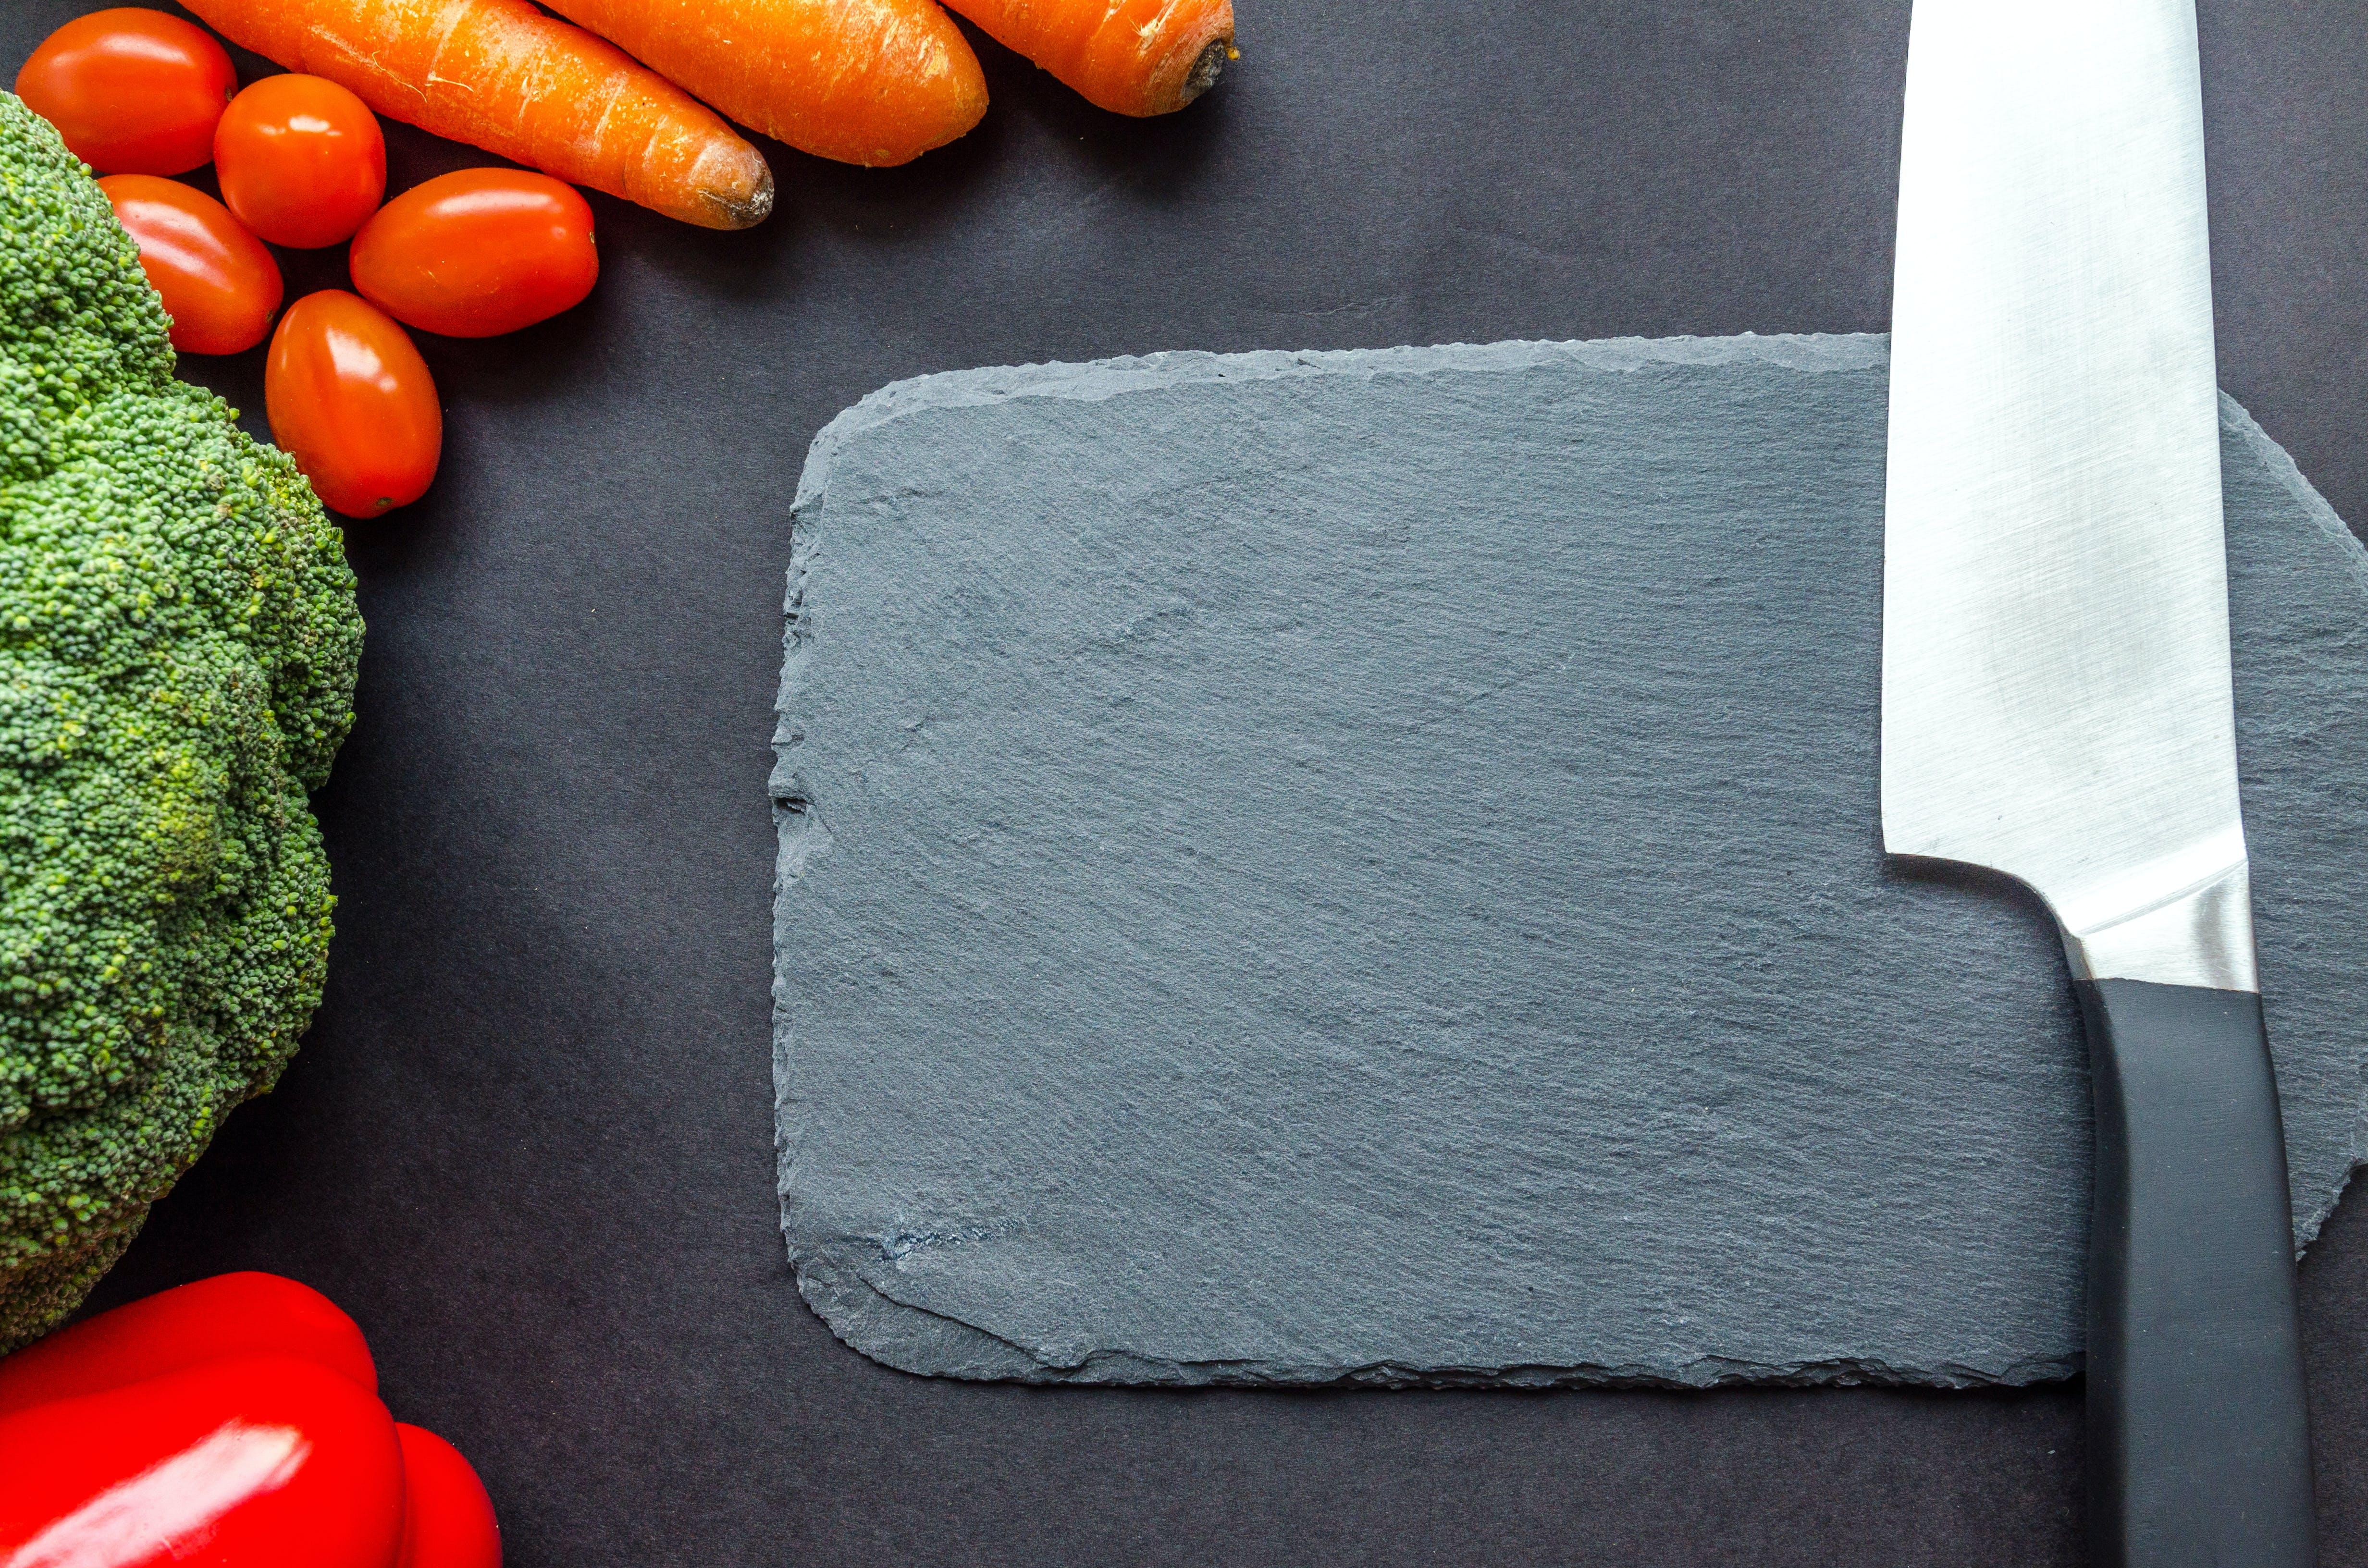 Black Handle Knife Near the Carrots